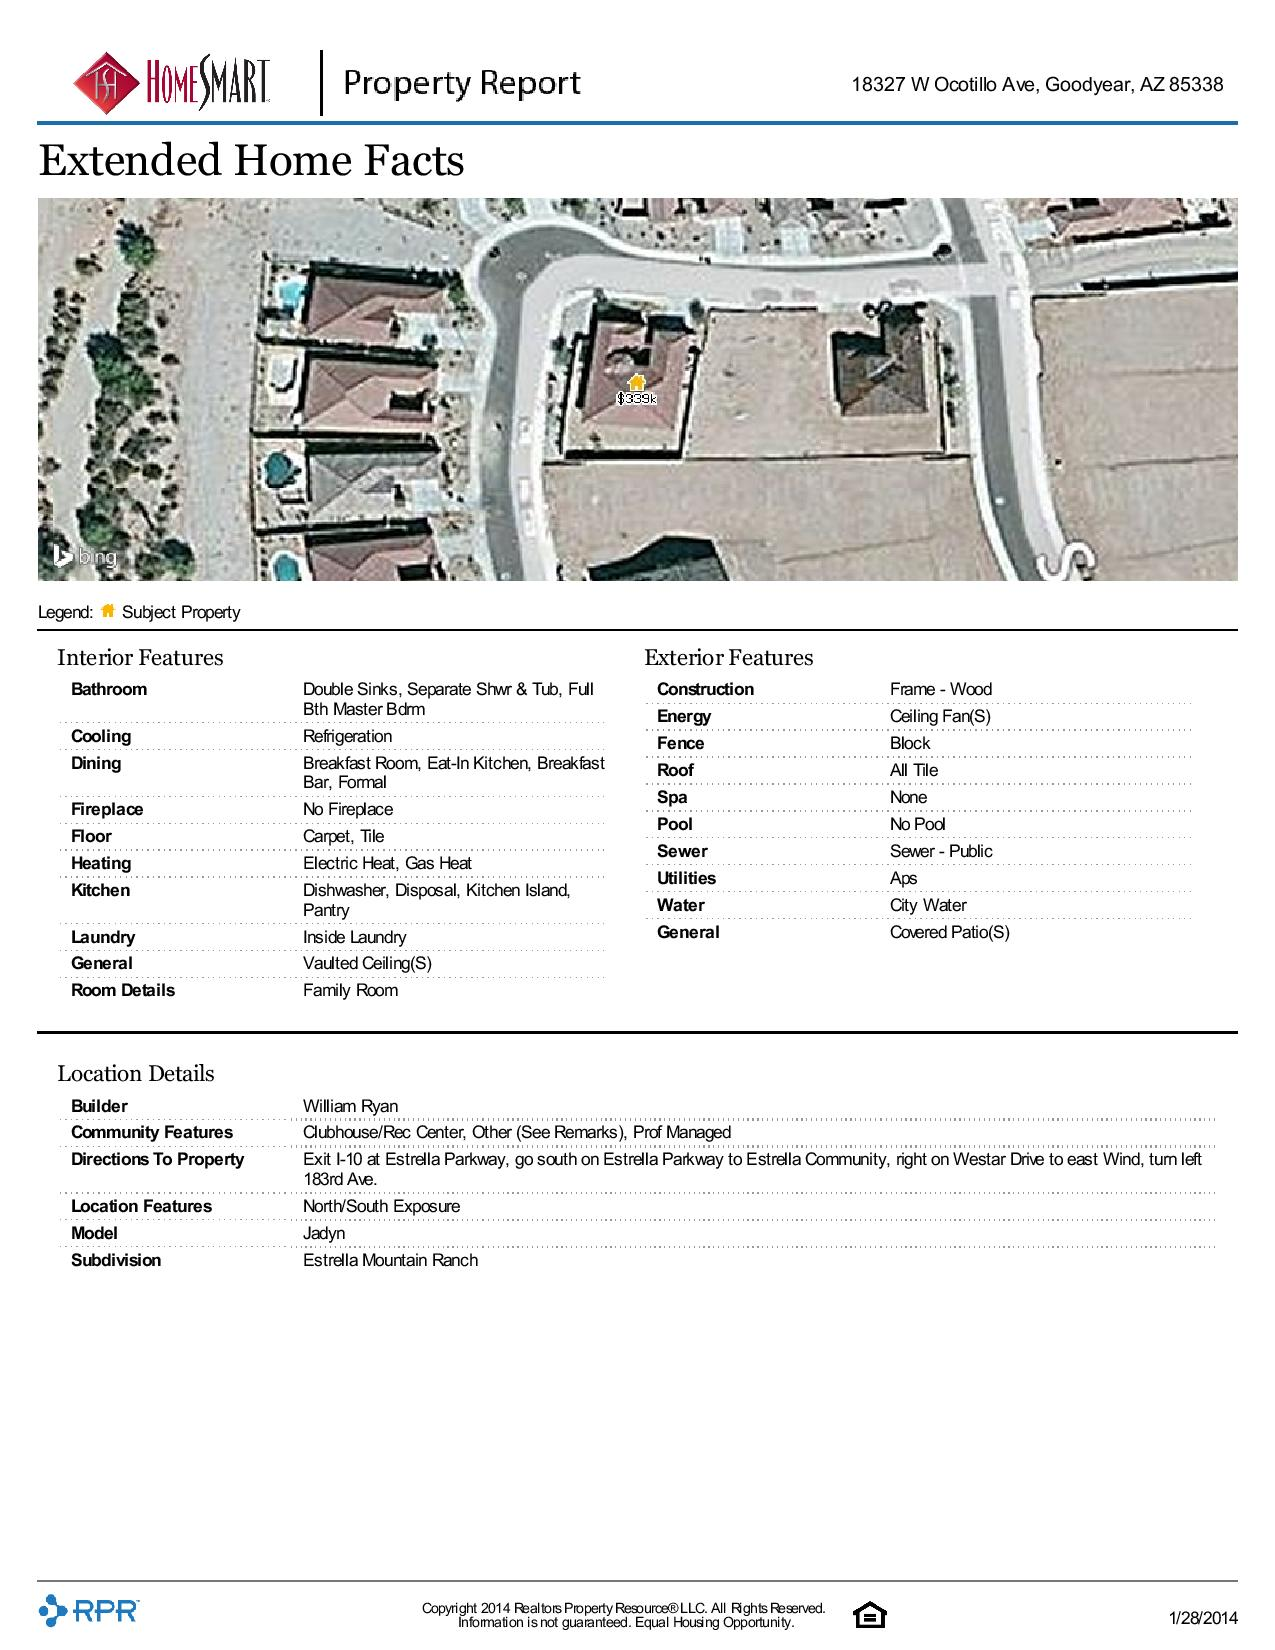 18327-W-Ocotillo-Ave-Goodyear-AZ-85338.pdf-page-004